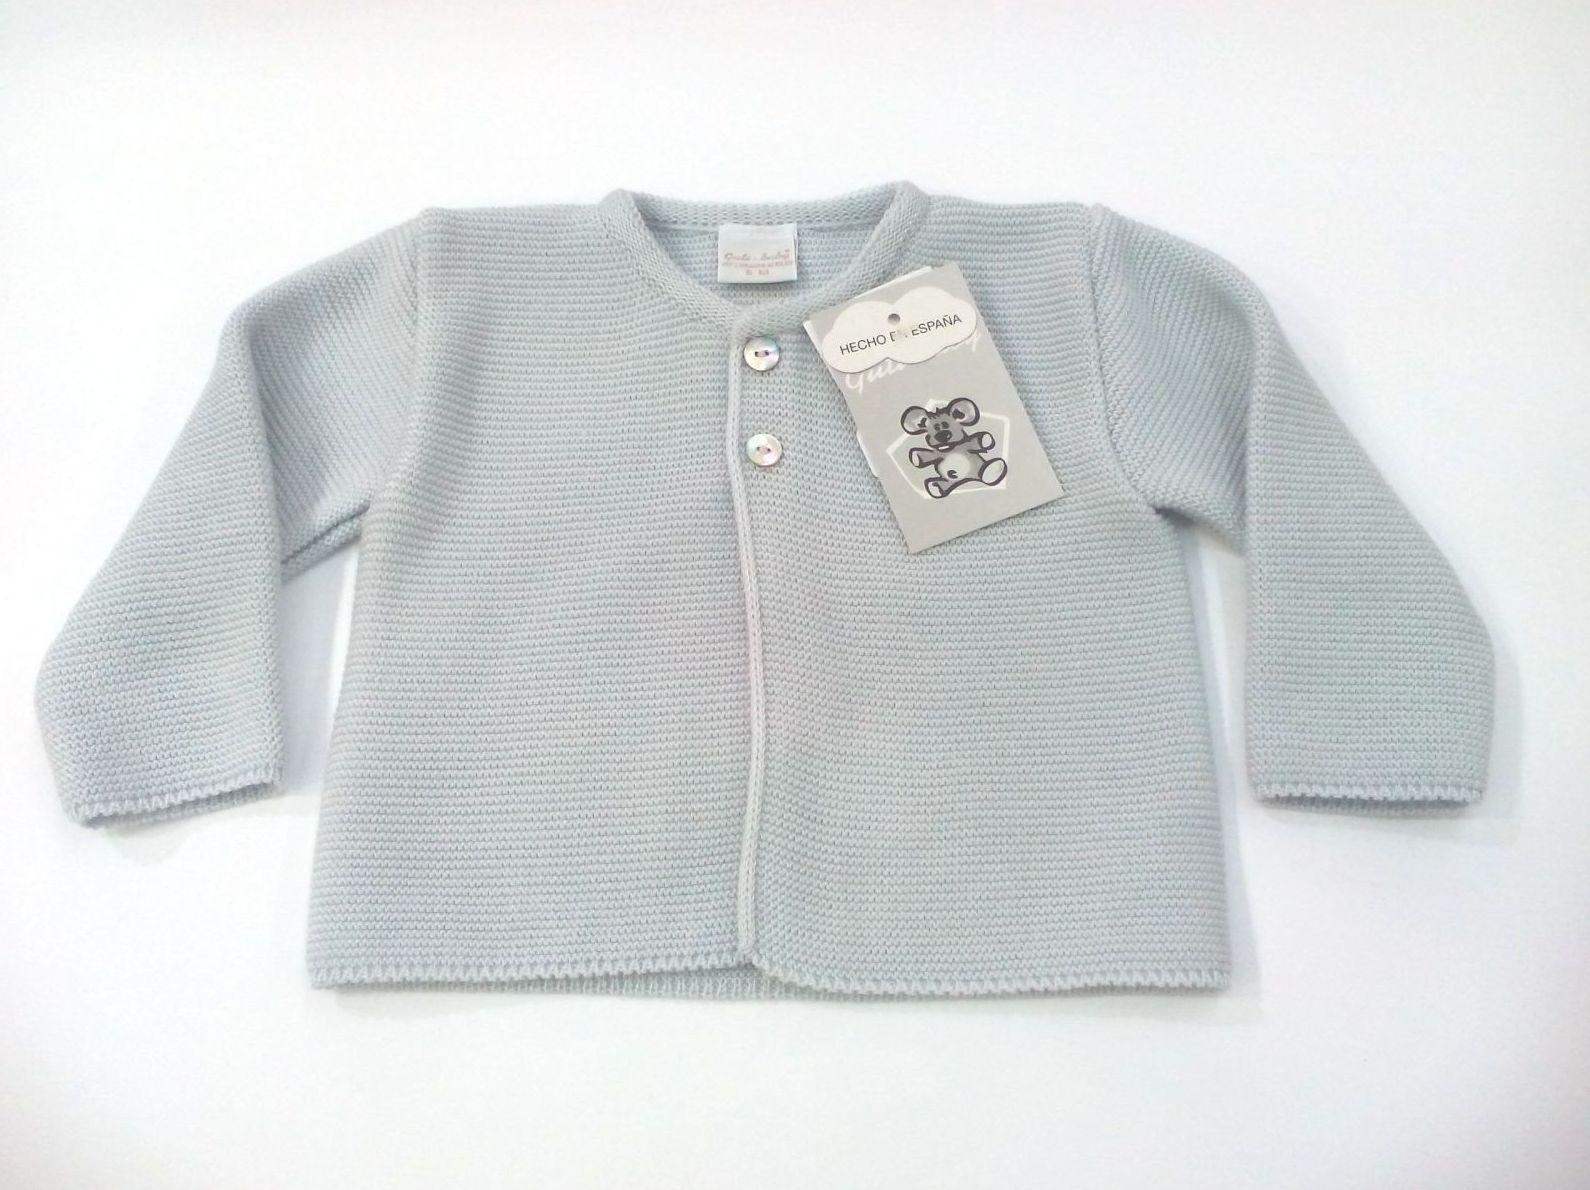 Chaqueta de niño perlé gris